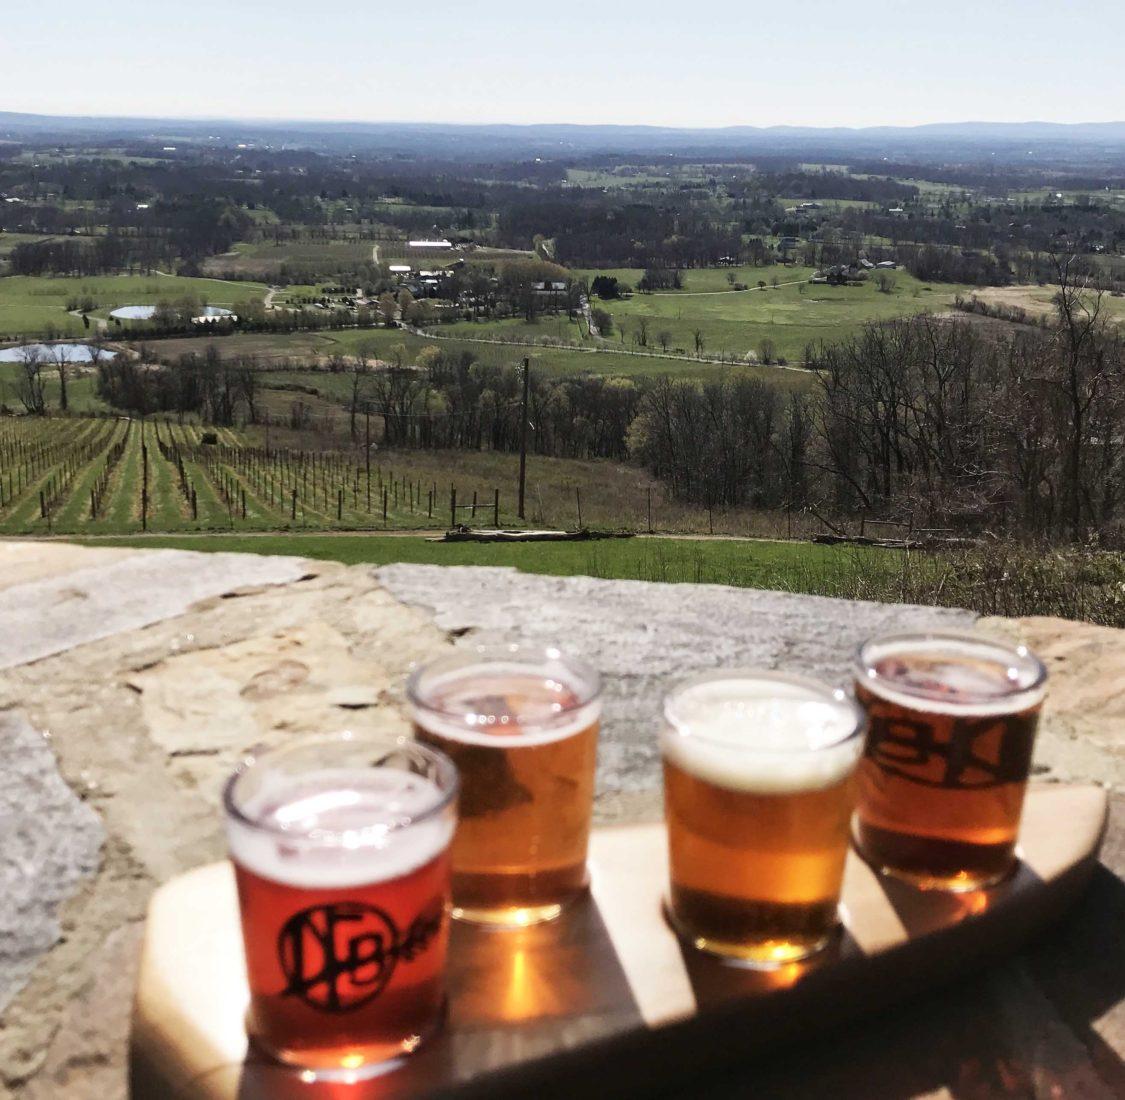 324. Dirt Farm Brewing Co, Bluemont VA, 2017